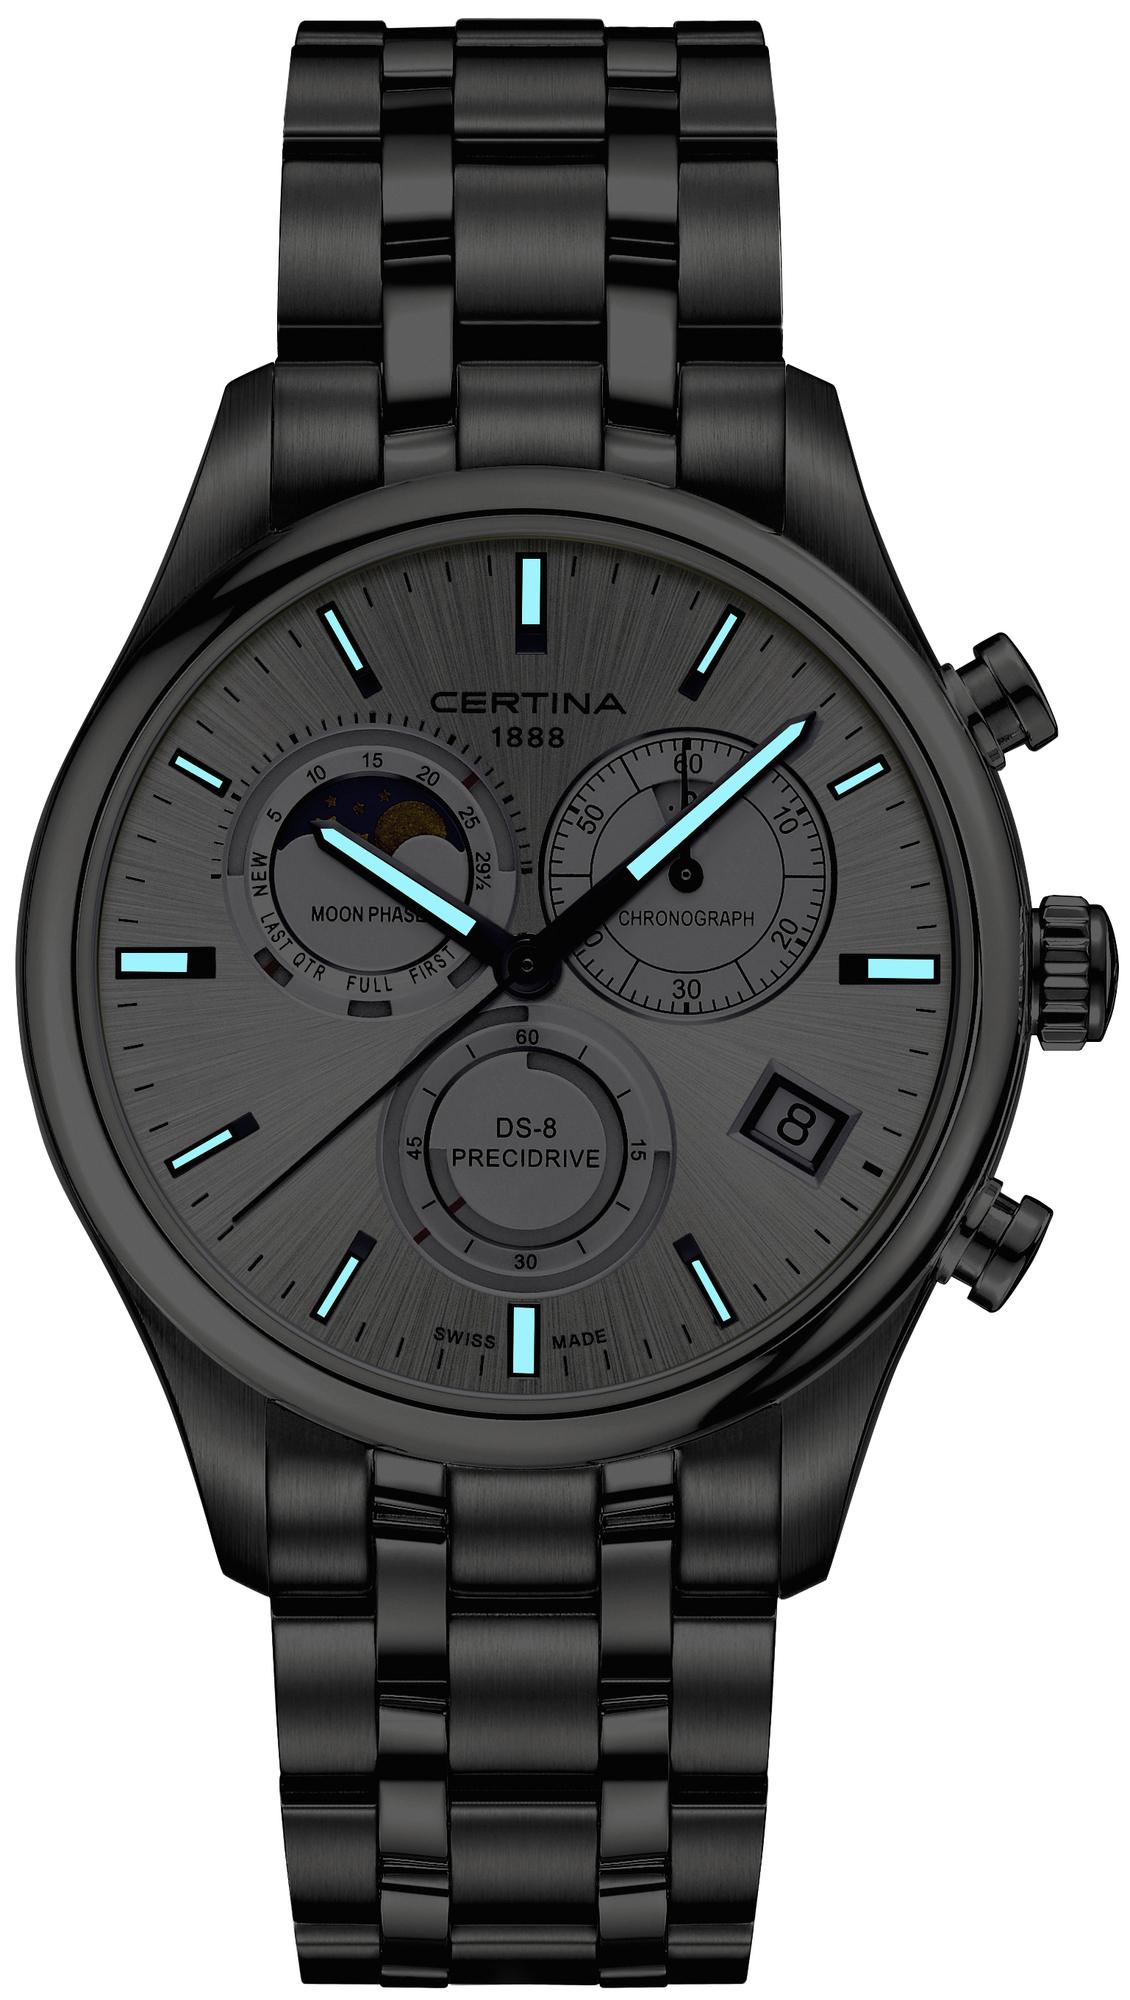 zegarek Certina C033.450.11.031.00 DS-8 Chronograph Moon Phase męski z chronograf DS-8